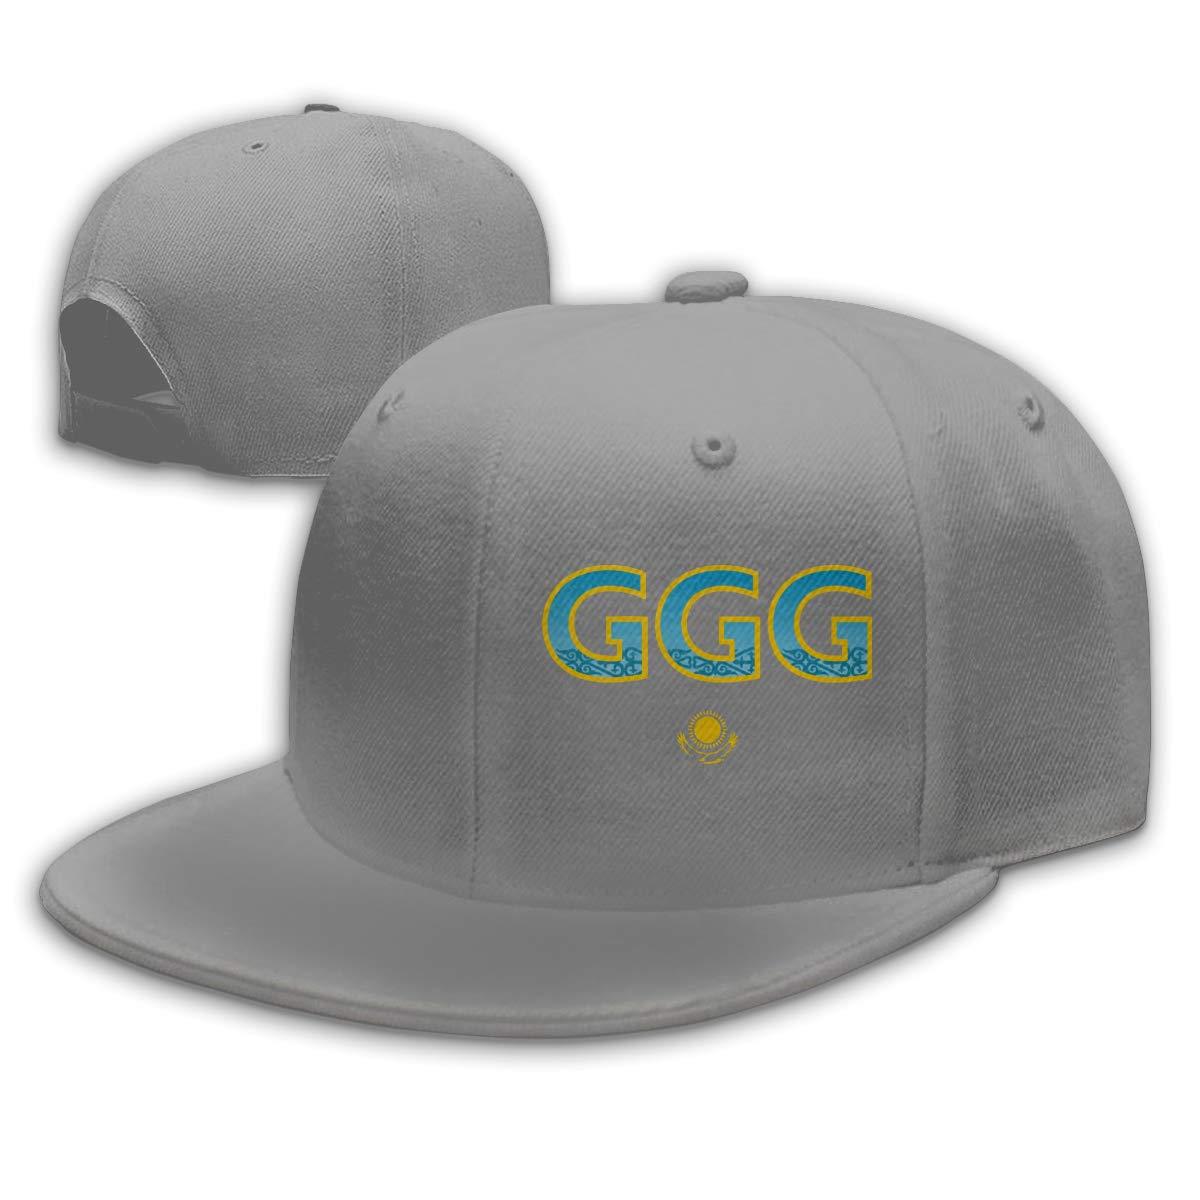 WANGTONG GGG Boxing Unisex Snapback Hats Flat Bill Baseball Cap Dad Hat